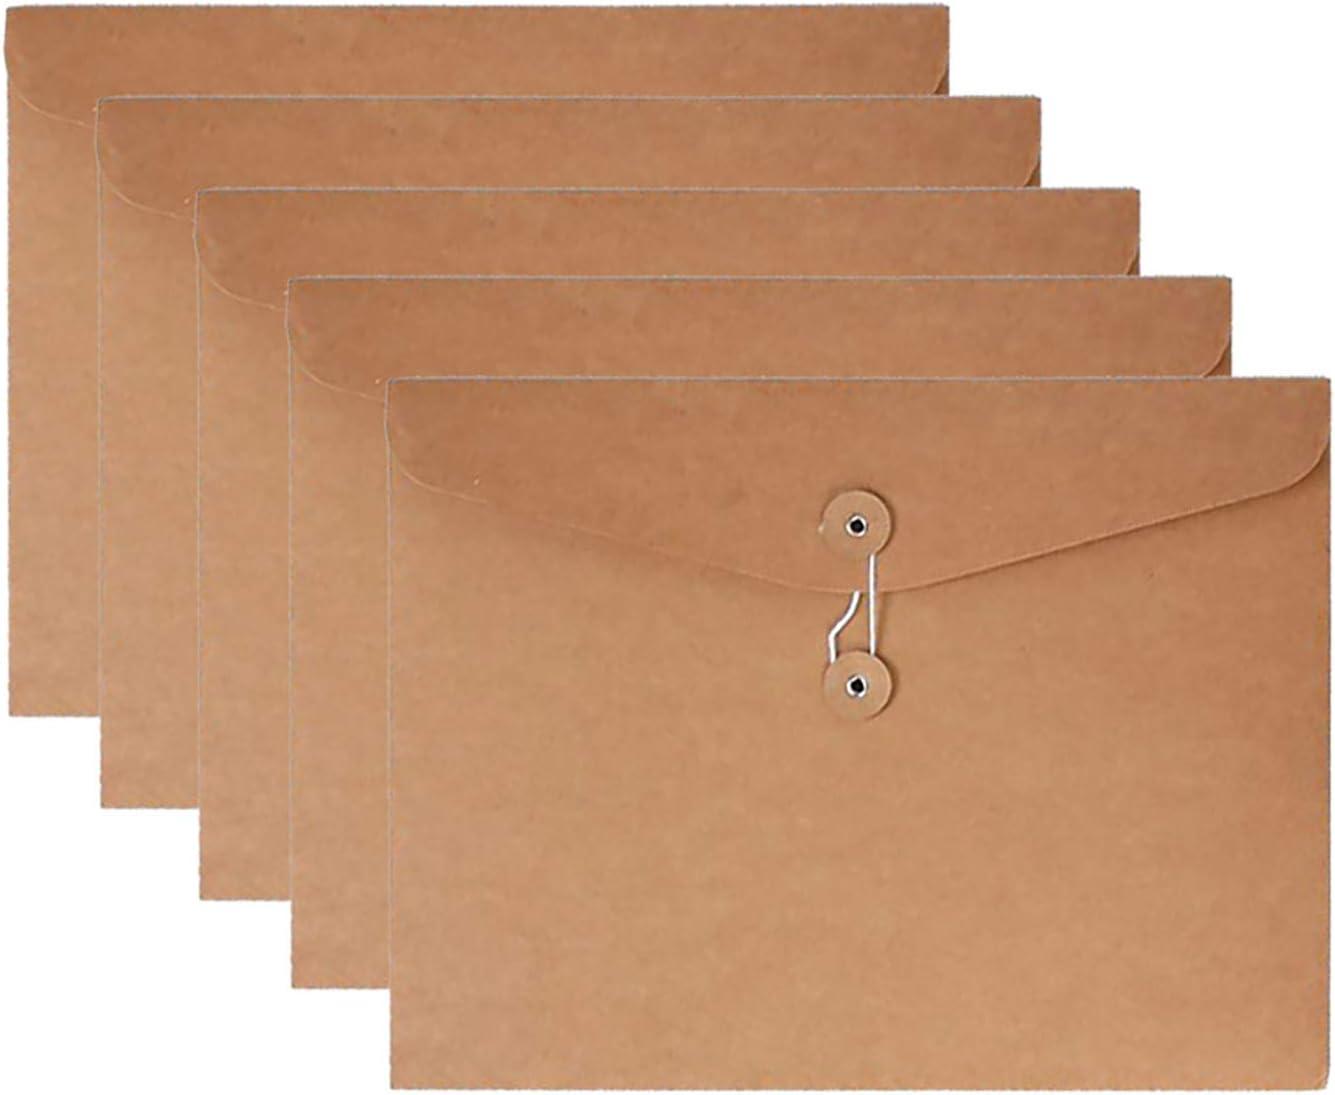 VANRA Kraft String Envelope File Pockets Folder Jac Project We OFFer at cheap prices Large special price